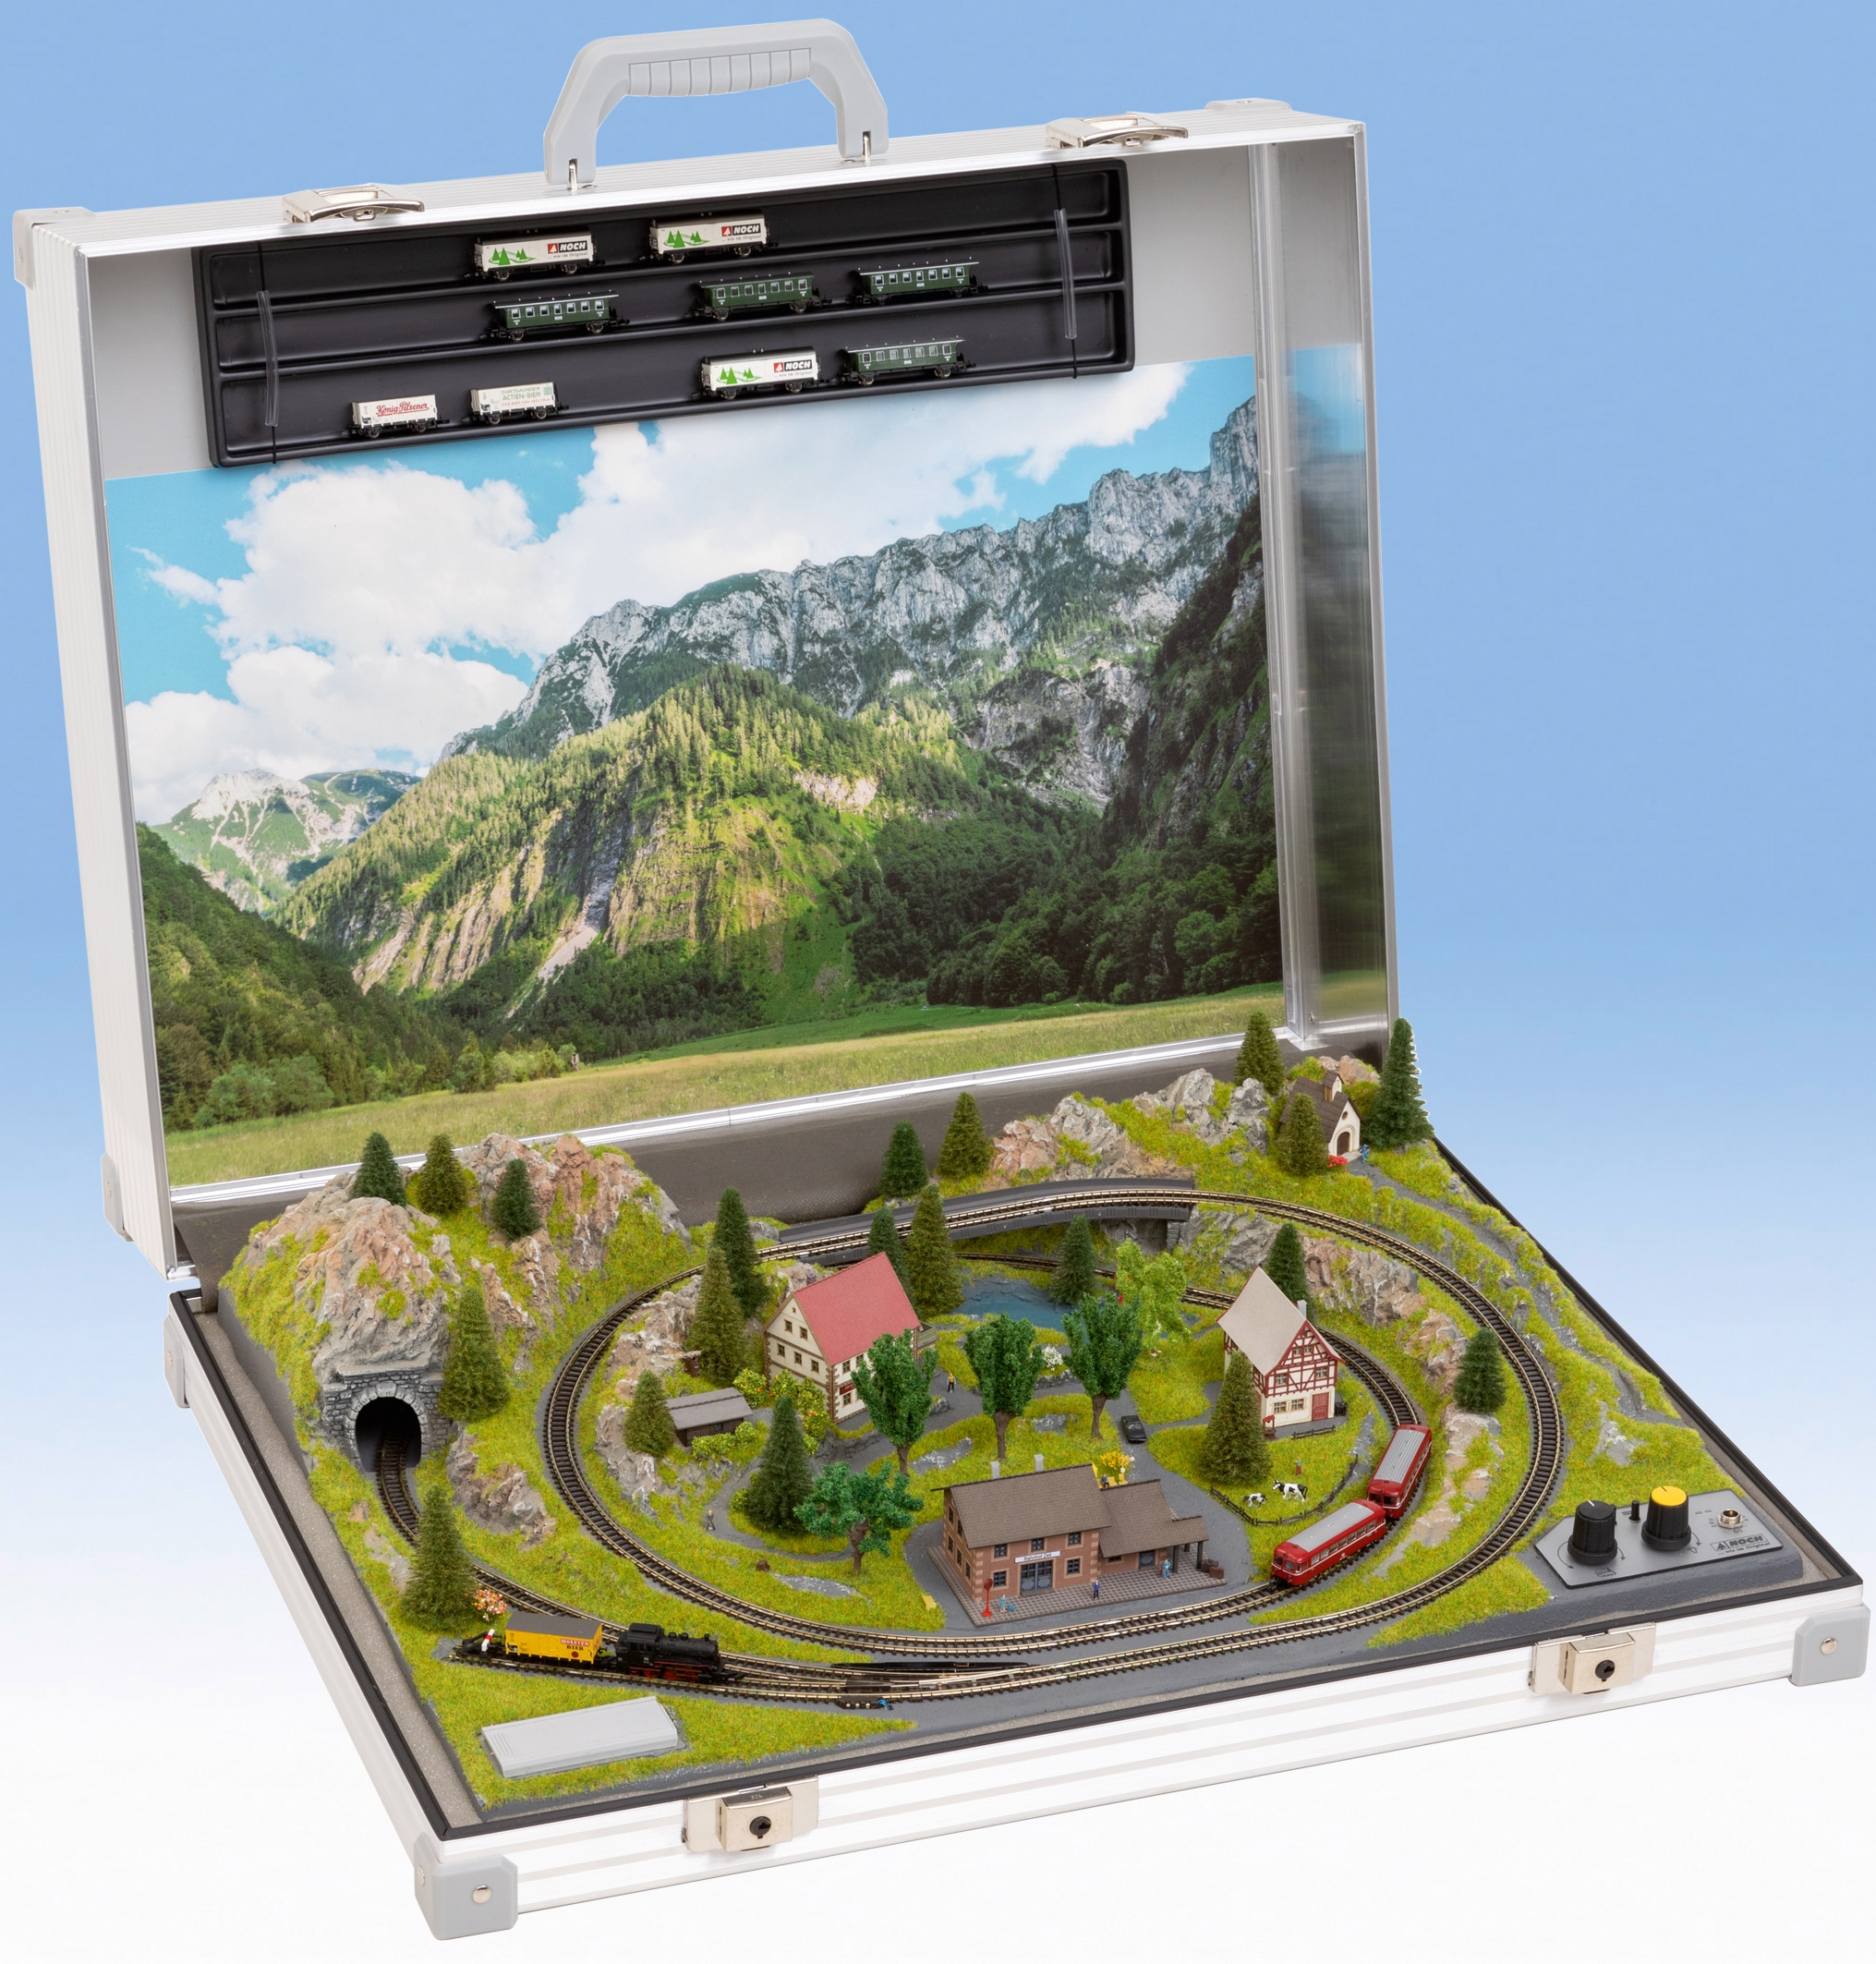 NOCH Modelleisenbahn-Set Modellbahnkoffer Serfaus, Made in Germany silberfarben Kinder Modelleisenbahn-Sets Modelleisenbahnen Autos, Eisenbahn Modellbau